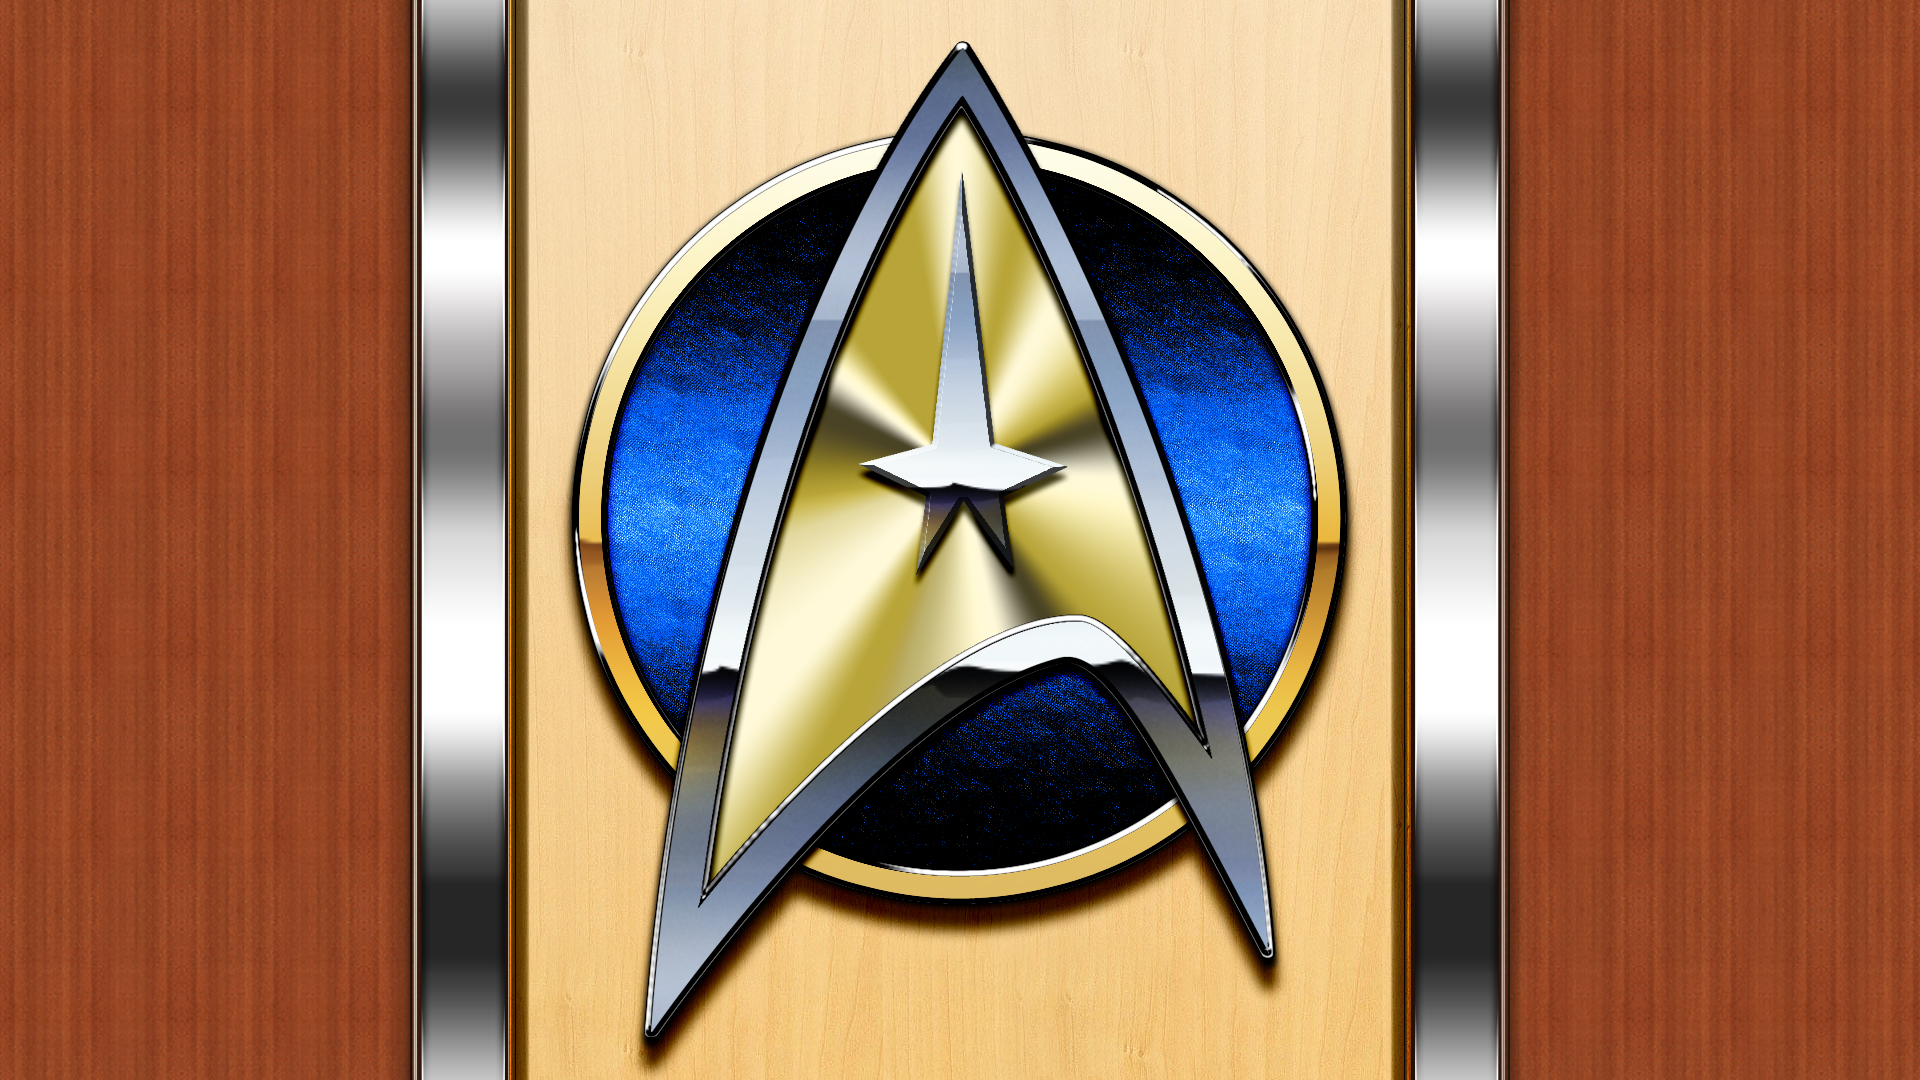 Starfleet arrowhead plaque by Balsavor